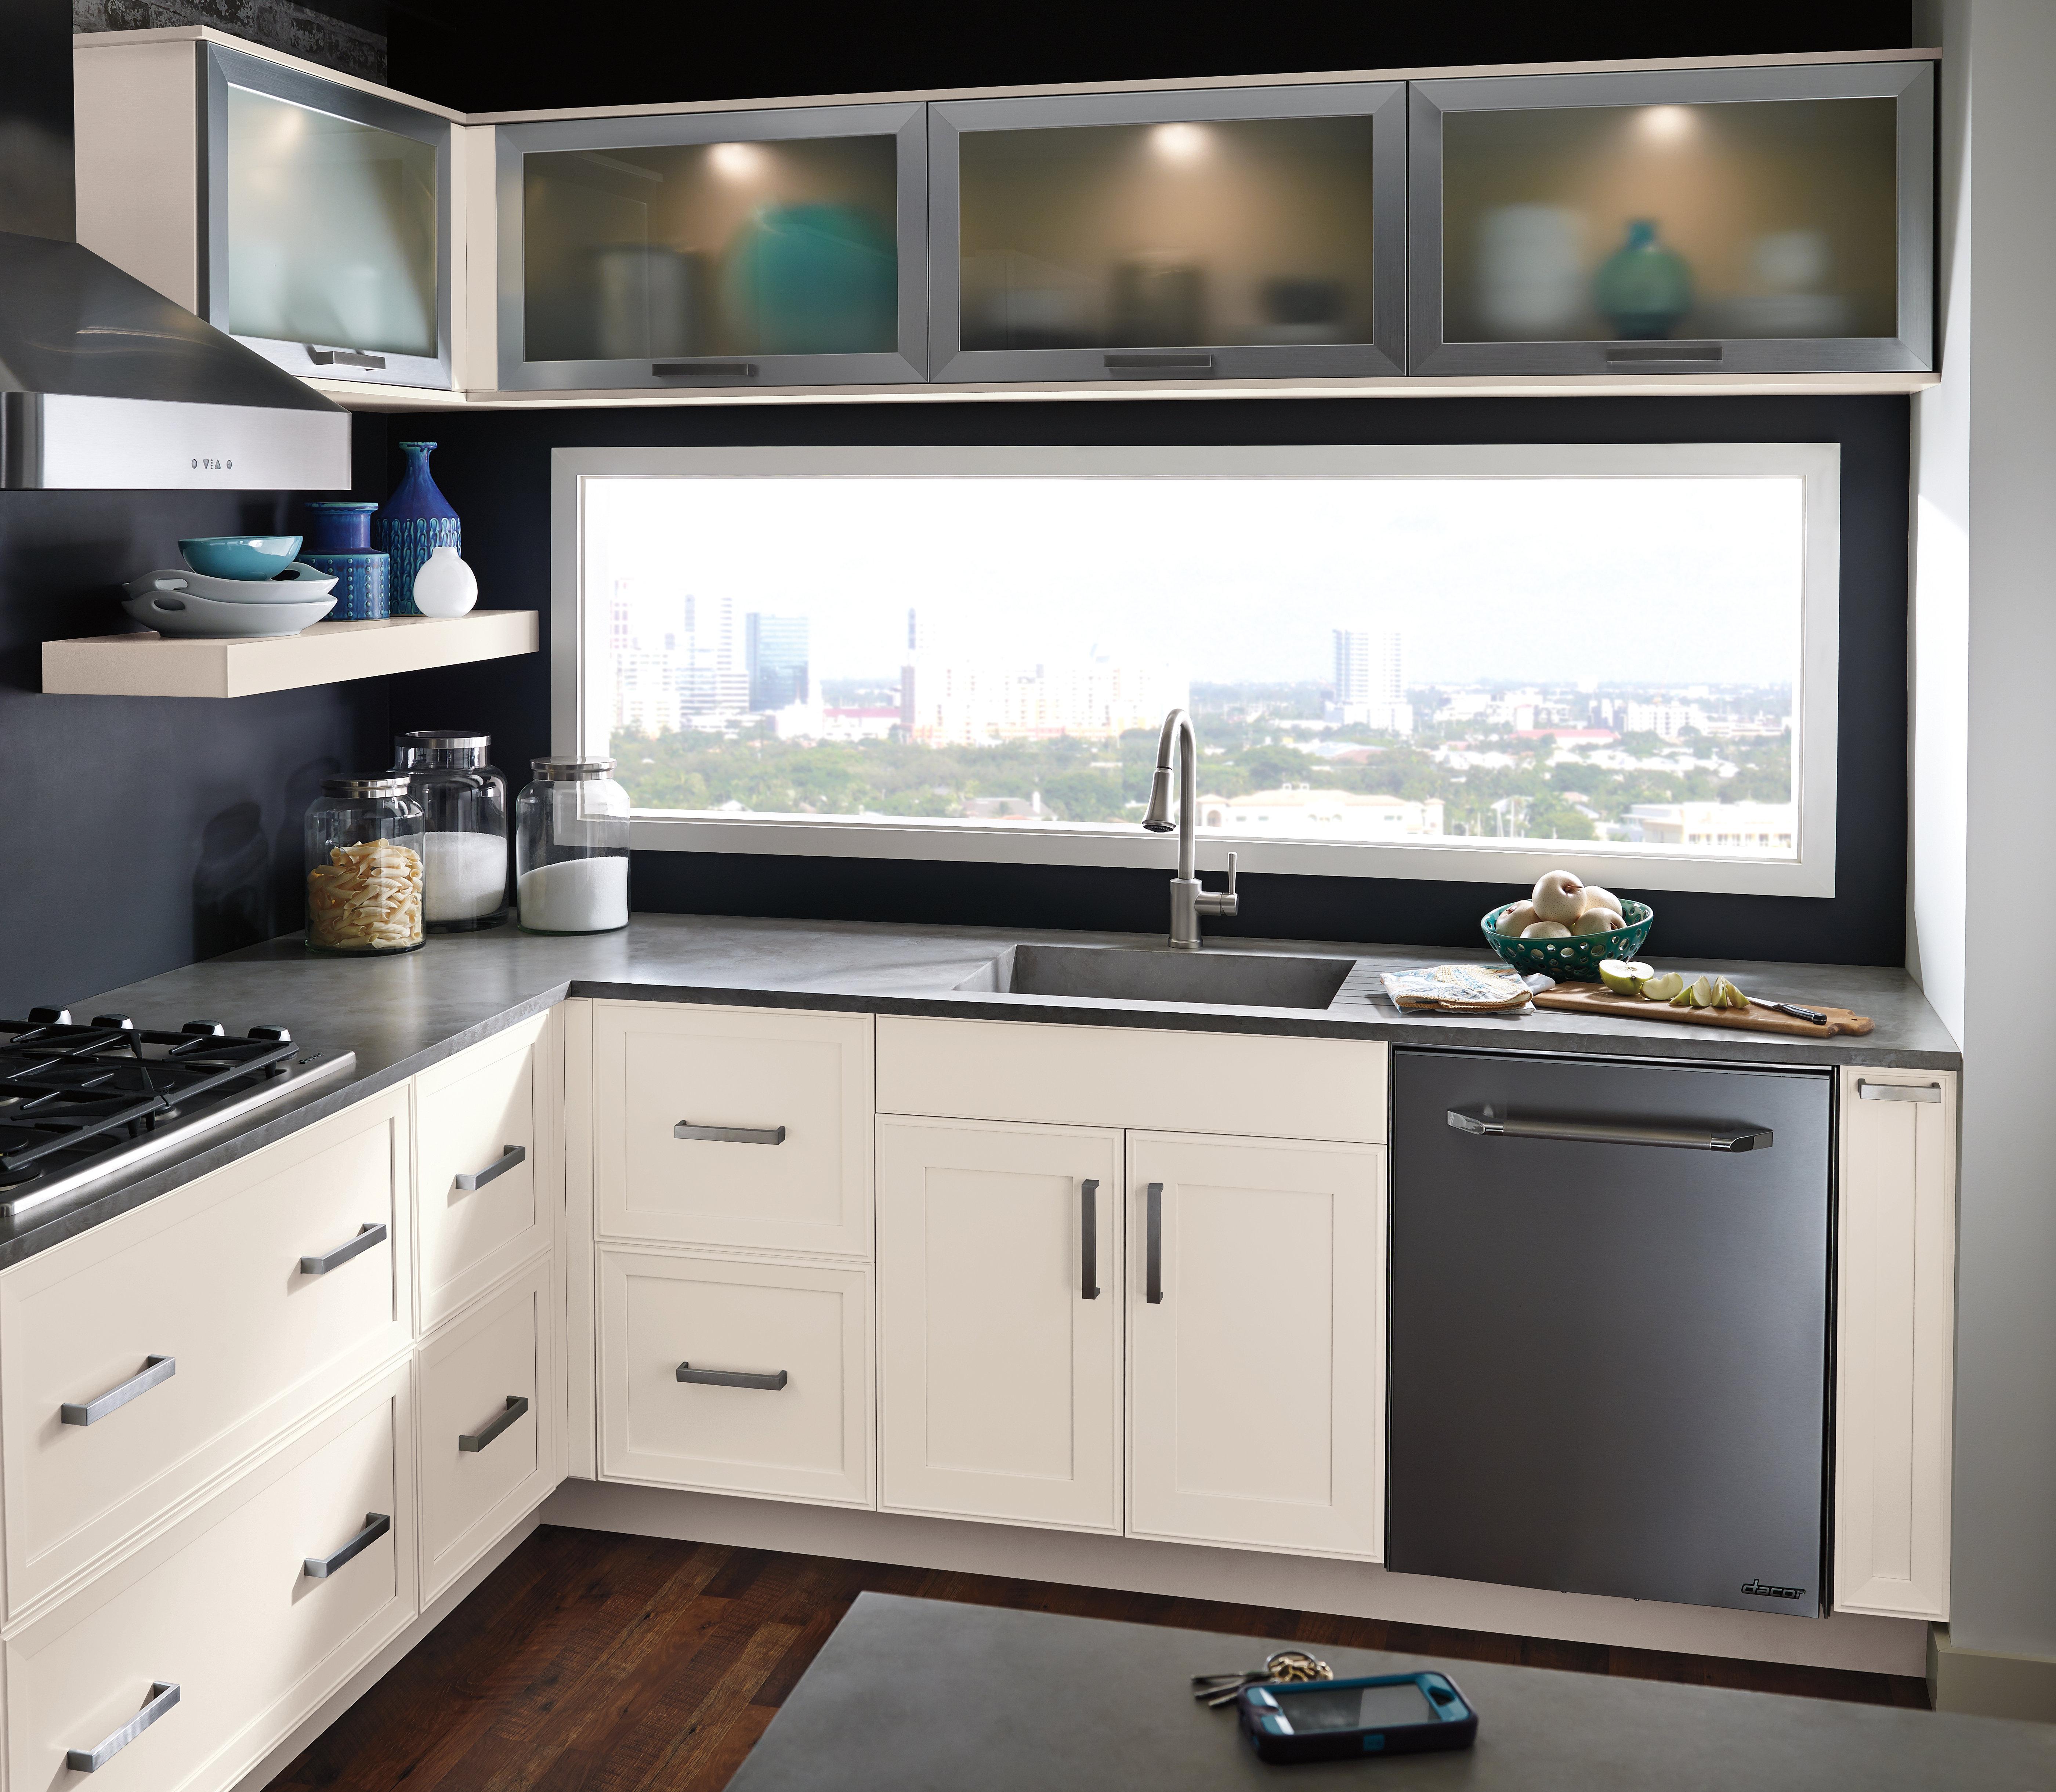 lightbox image q select kitchen design Select Cabinetry Cabinetry Cedar Falls Kitchen Design Cedar Falls sleek and simple loft kitchen